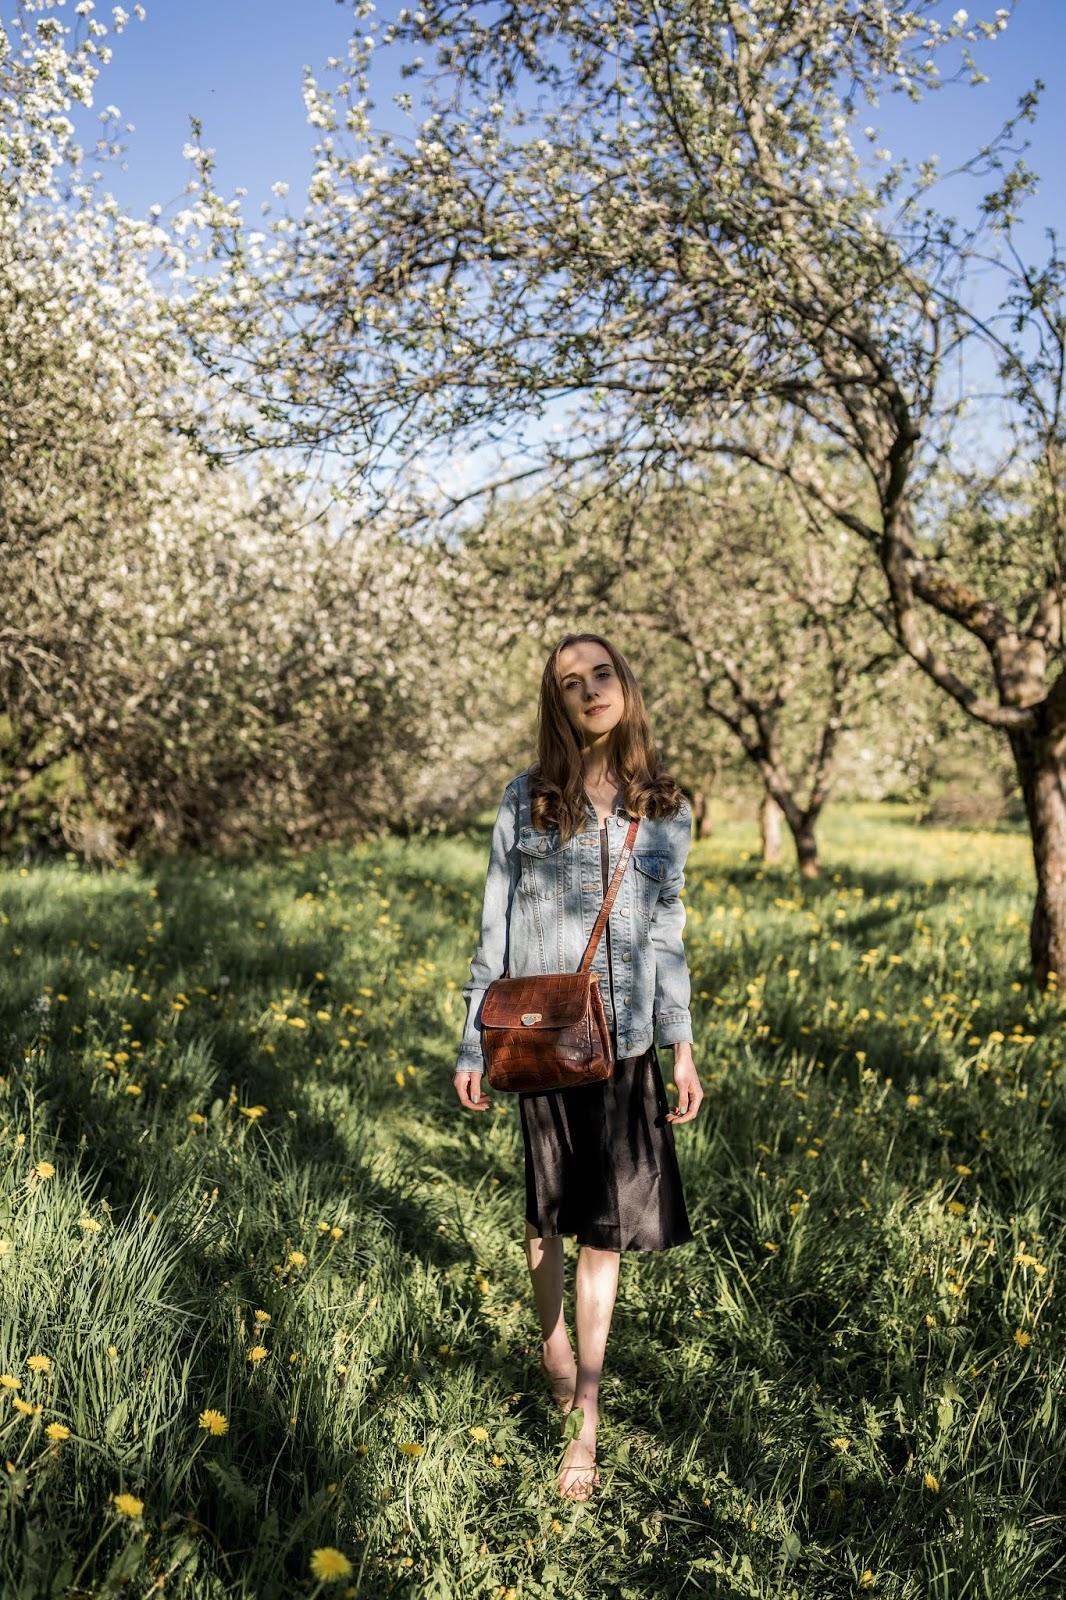 Black slip dress, denim jacket and tan coloured vintage Furla crossbody bag // Musta satiinimekko, farkkutakki ja Furlan vintagelaukku